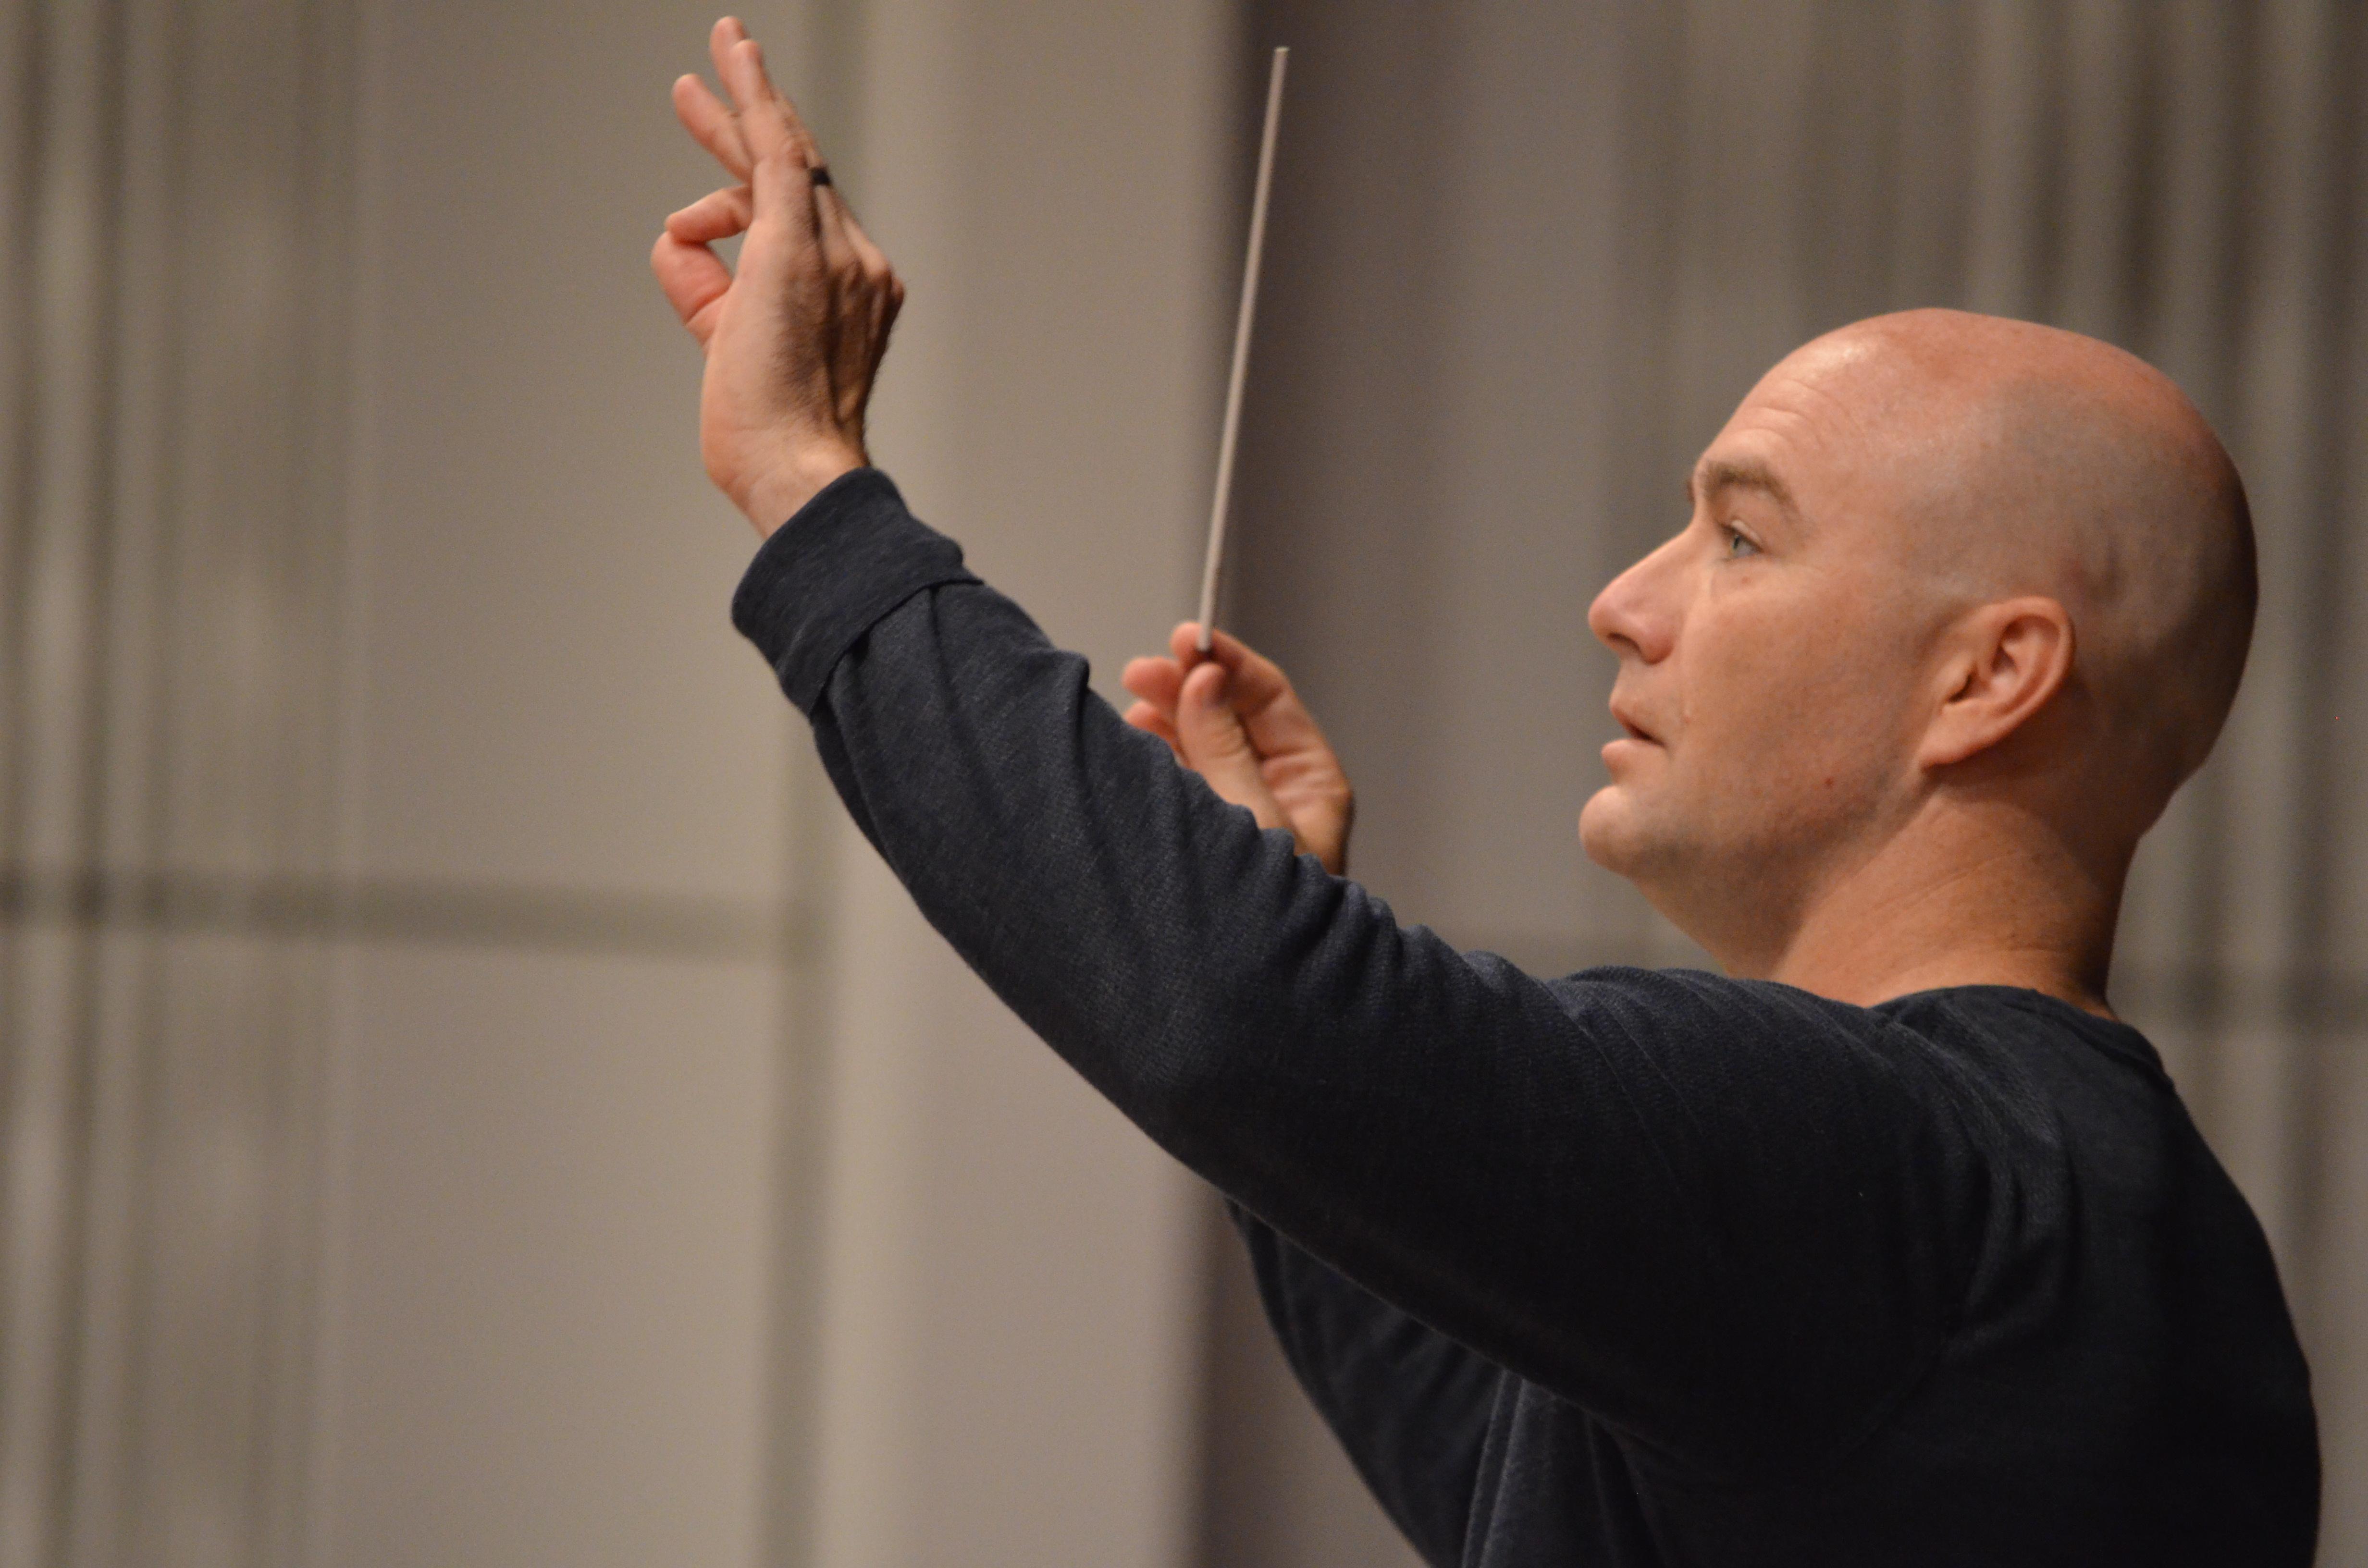 Maestro Huff in the Czech Republic